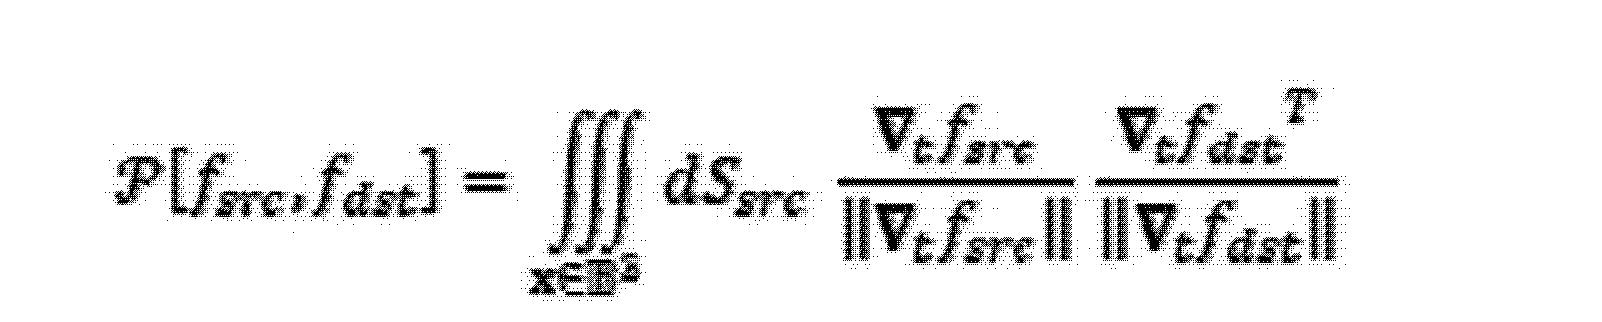 Figure CN104282036AD00424